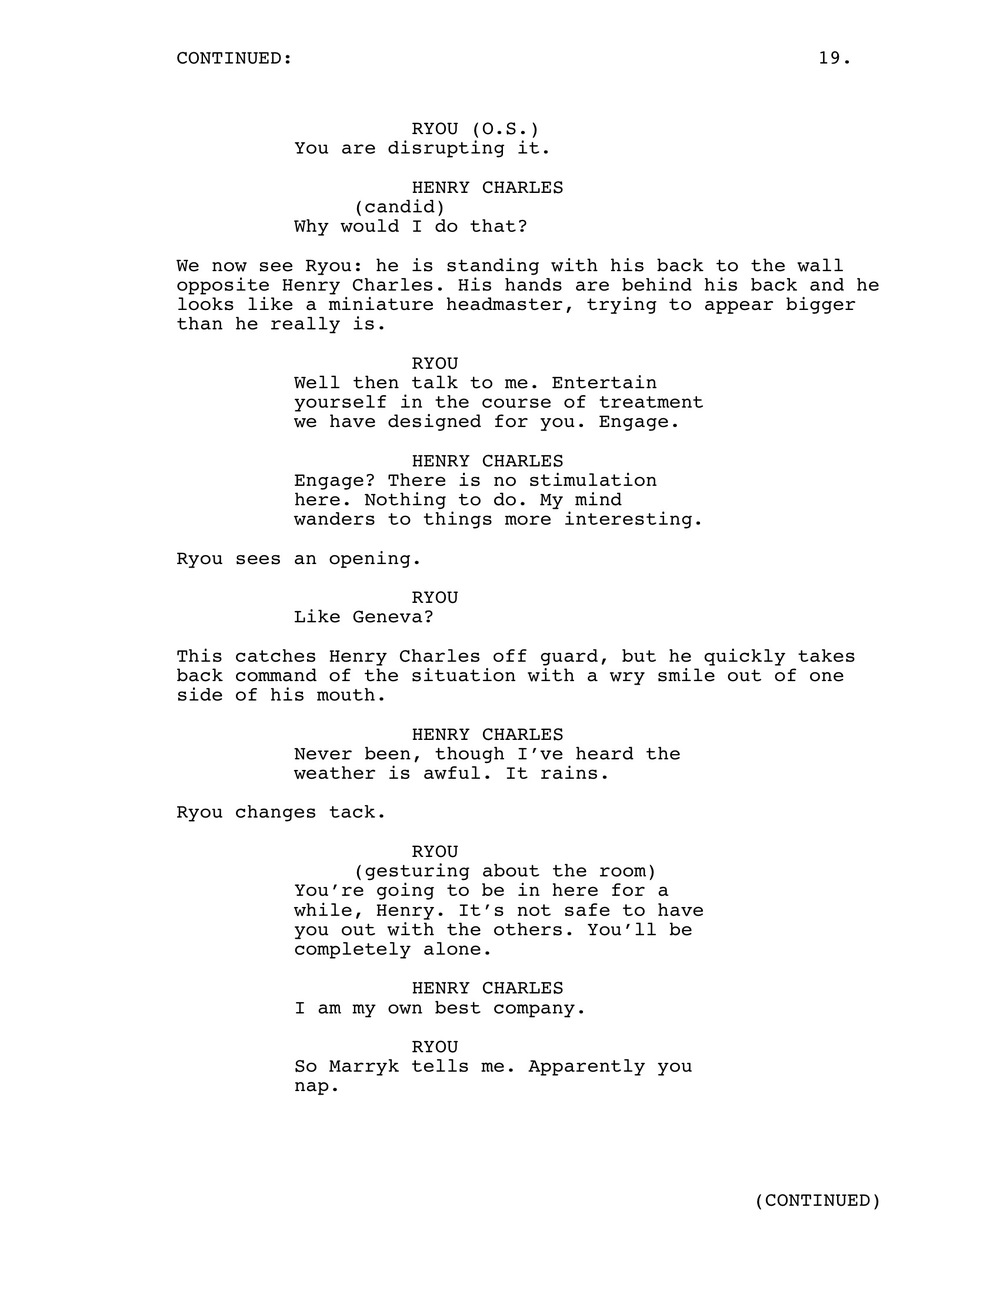 'Introducing Henry Charles' (Pilot) by Alexander Craig | 19.jpeg